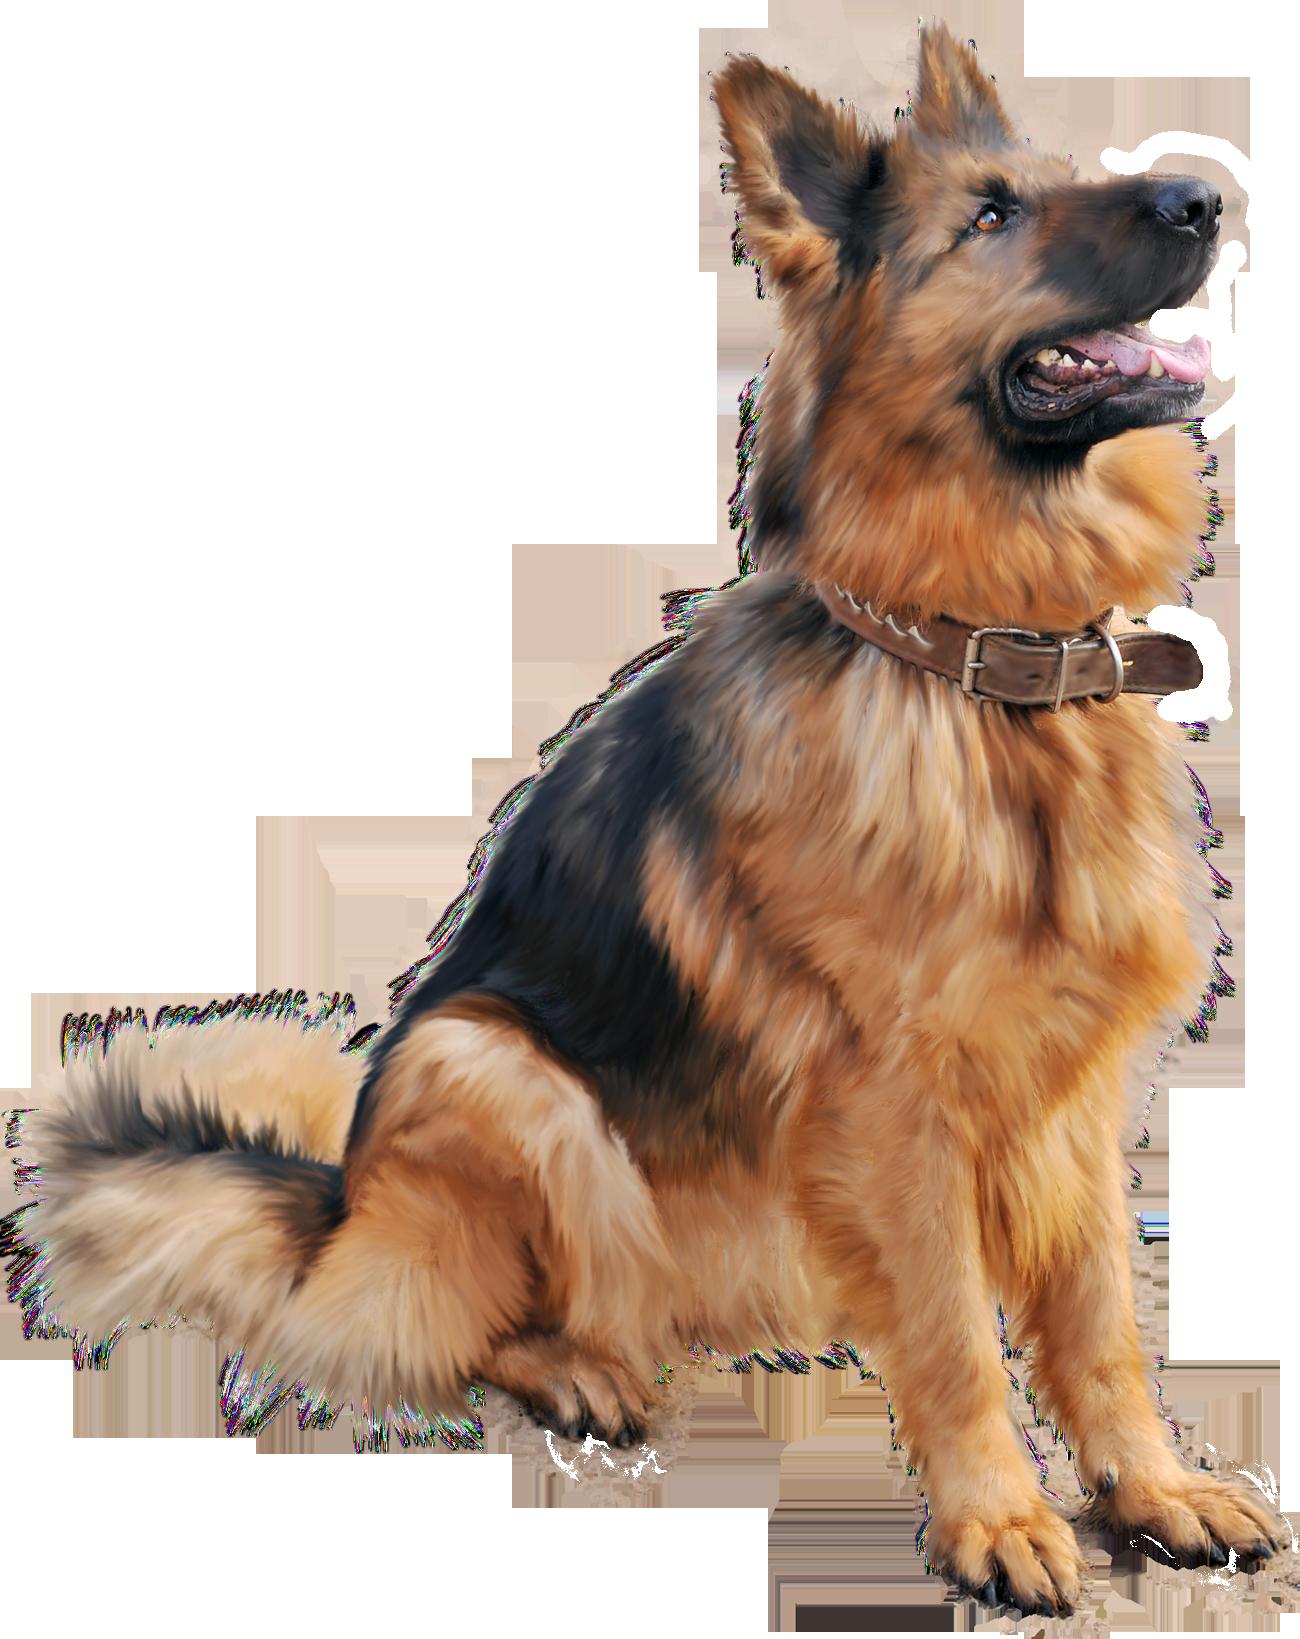 German shepherd dog sitting